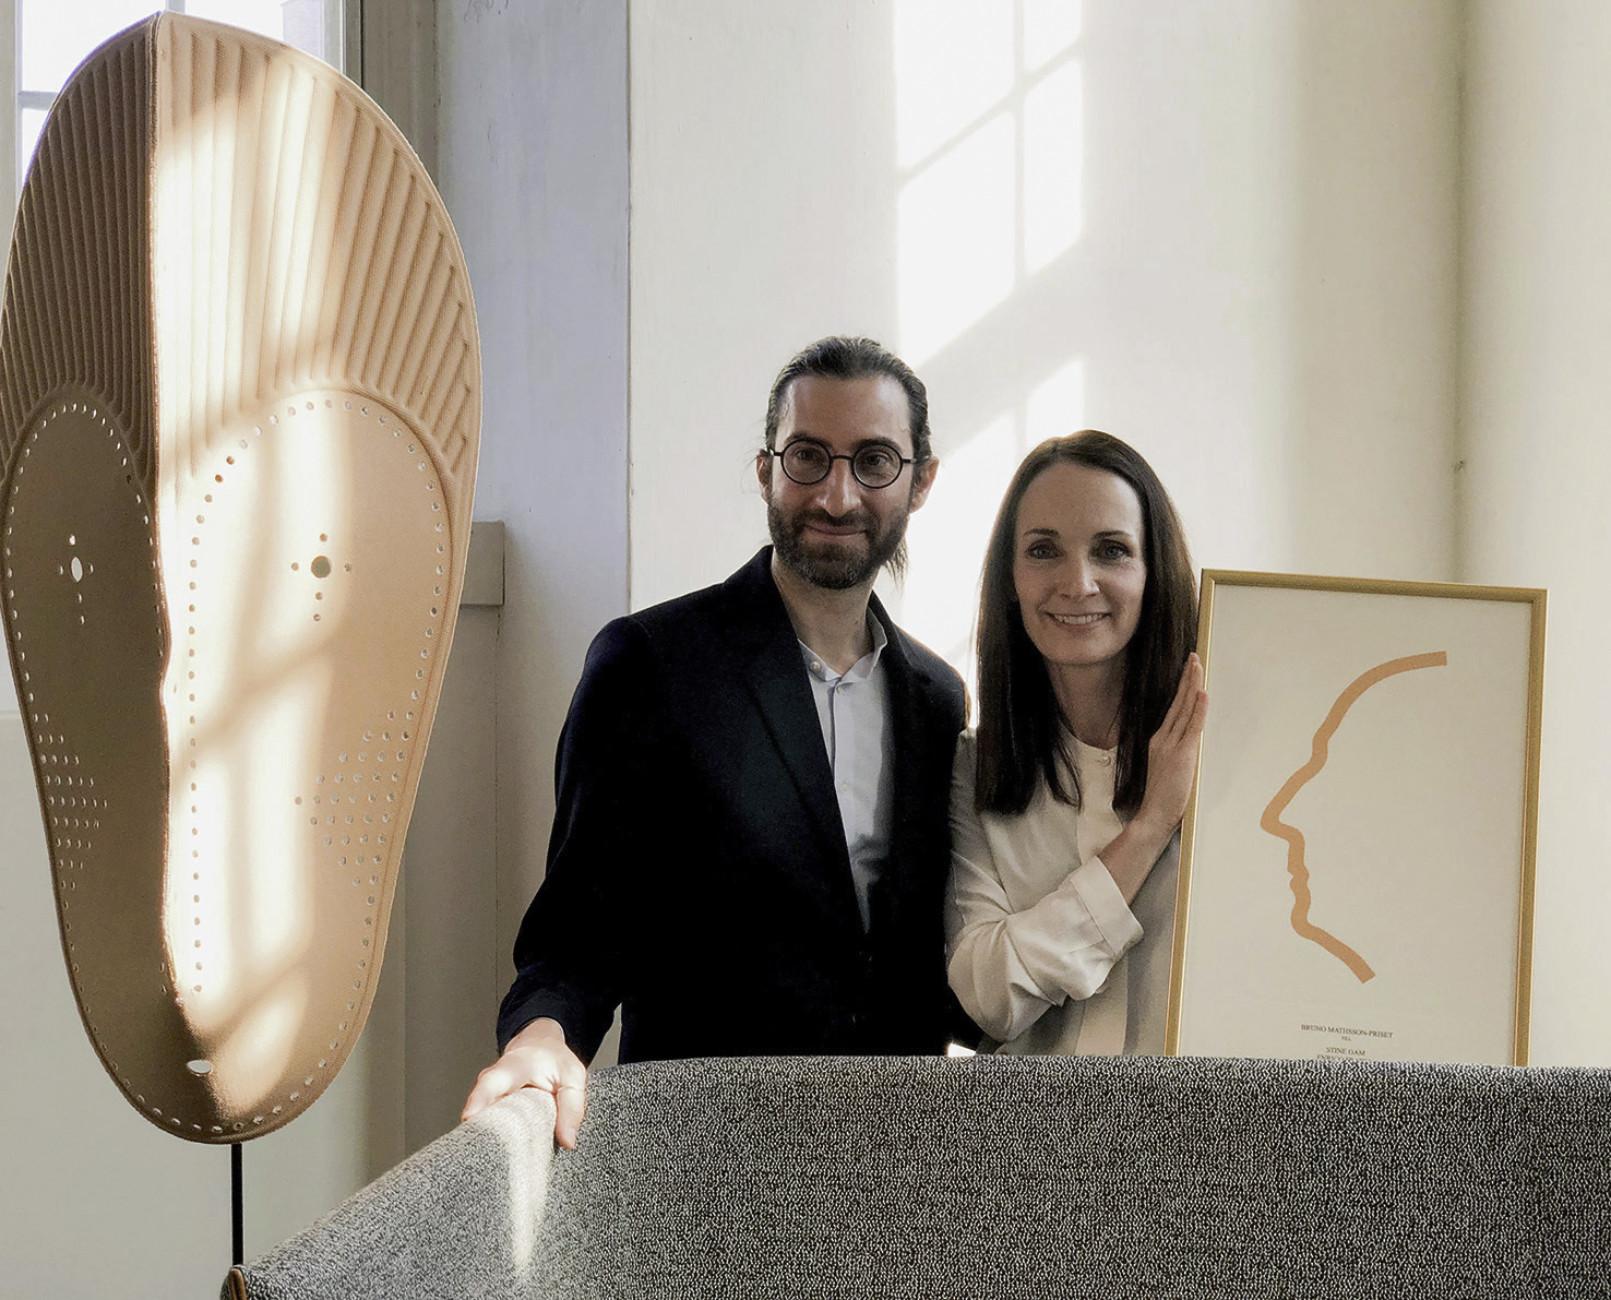 GamFratesi receive the Bruno Mattson Design Award